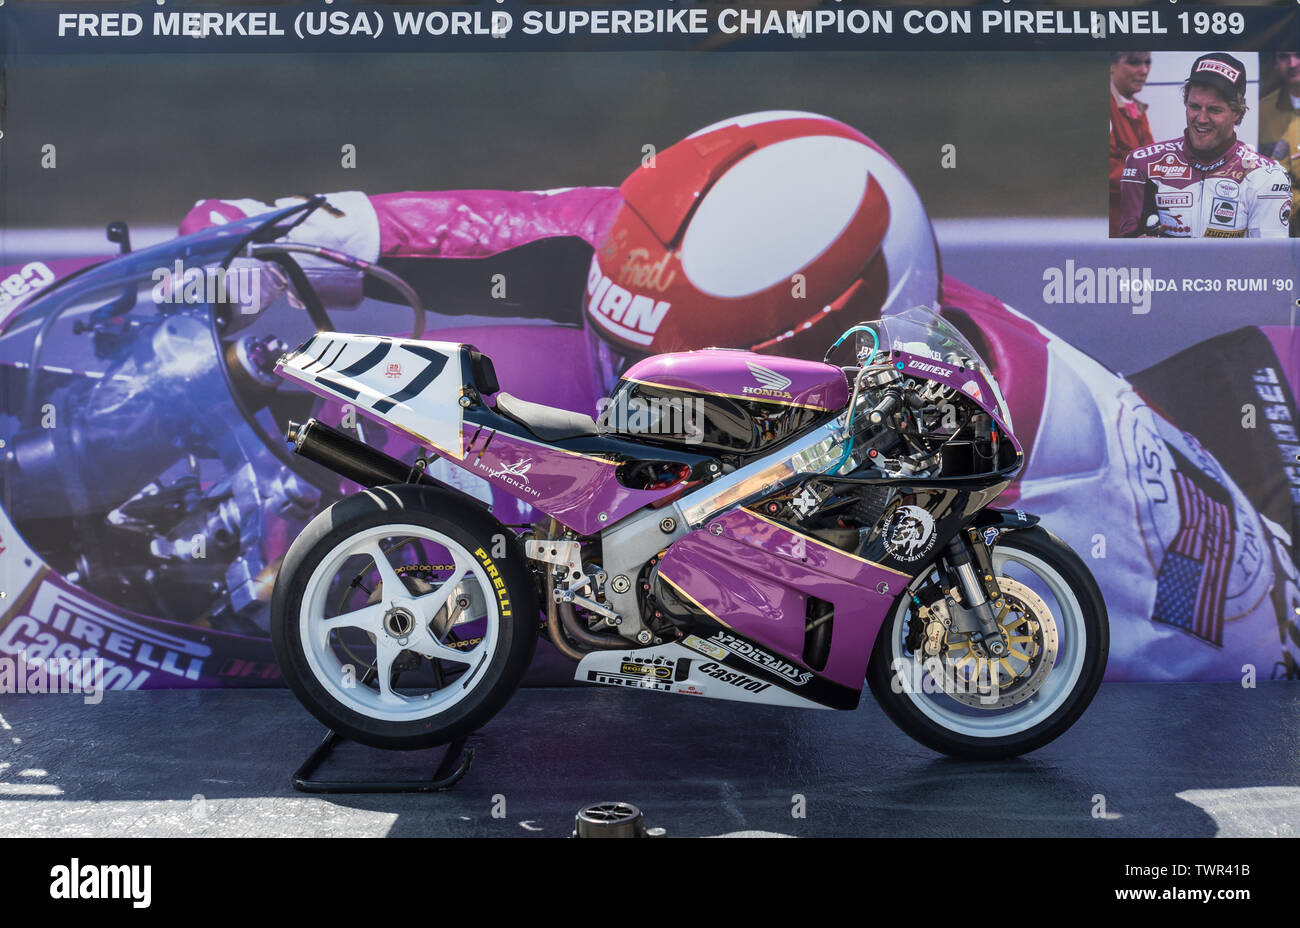 Honda VFR750R of Fred Merkel, former Superbike World Champion, on display at Imola, Italy Stock Photo